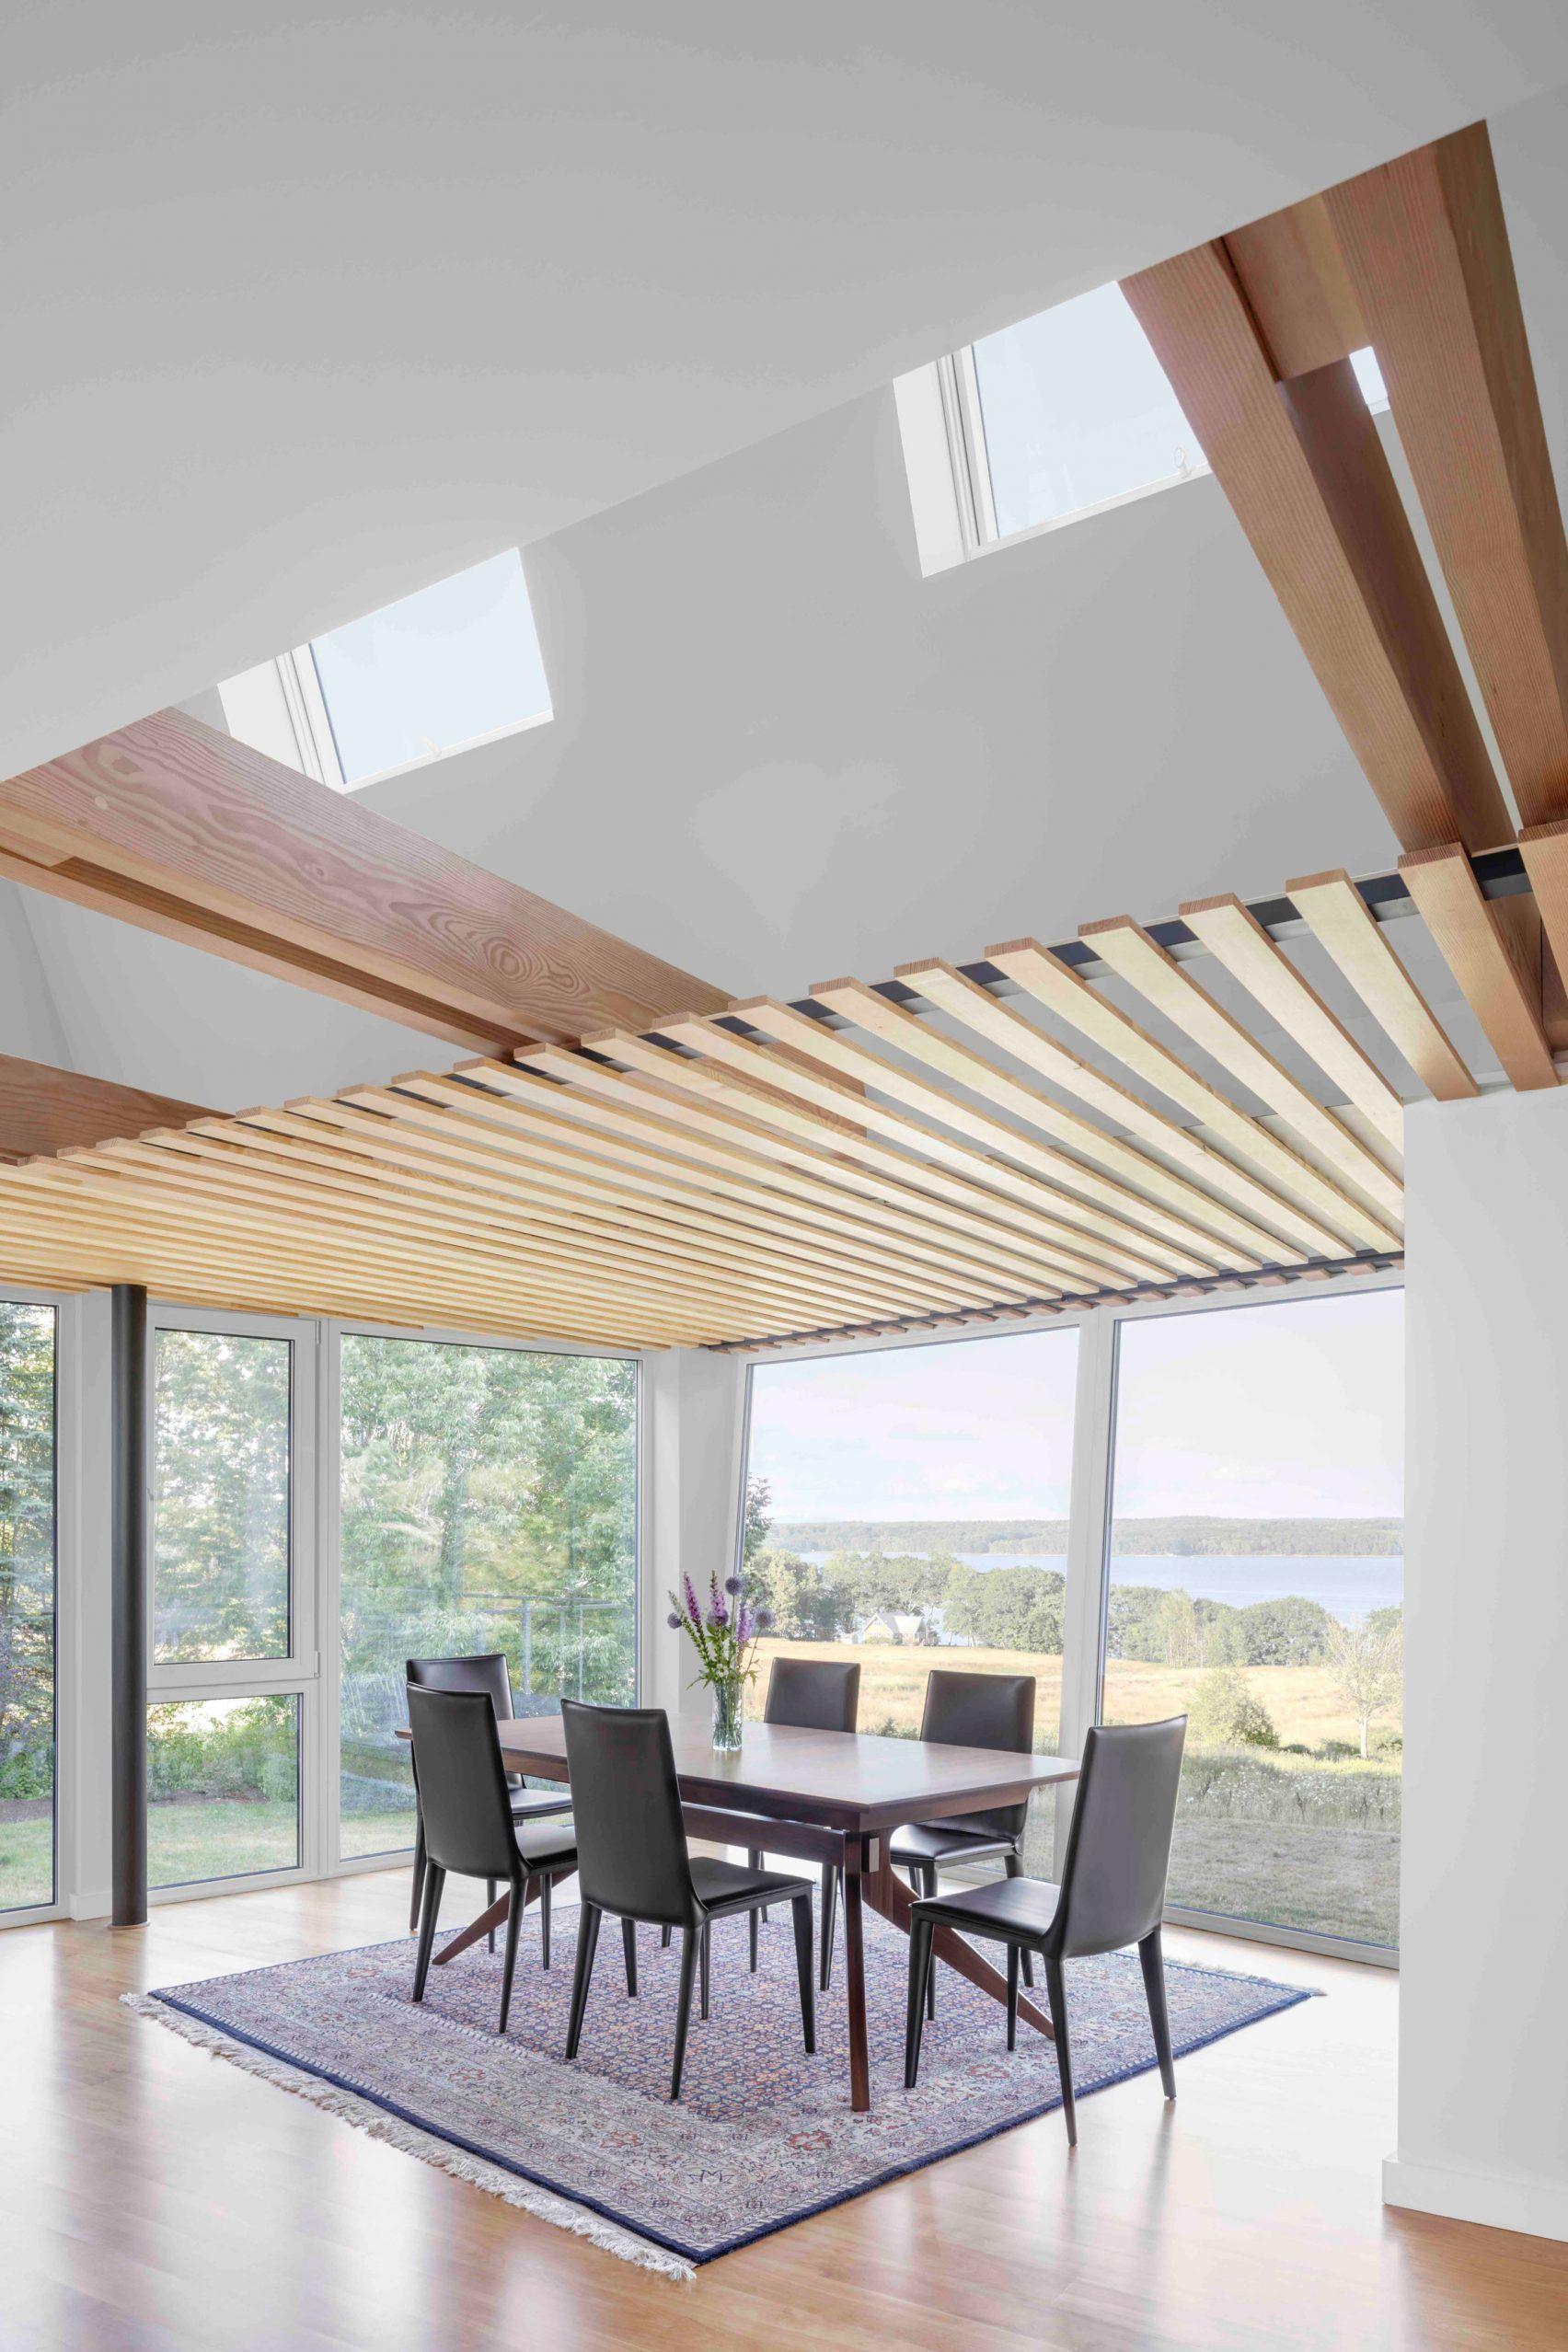 Photo irvin serrano sweet home make interior decoration design ideas also rh pinterest